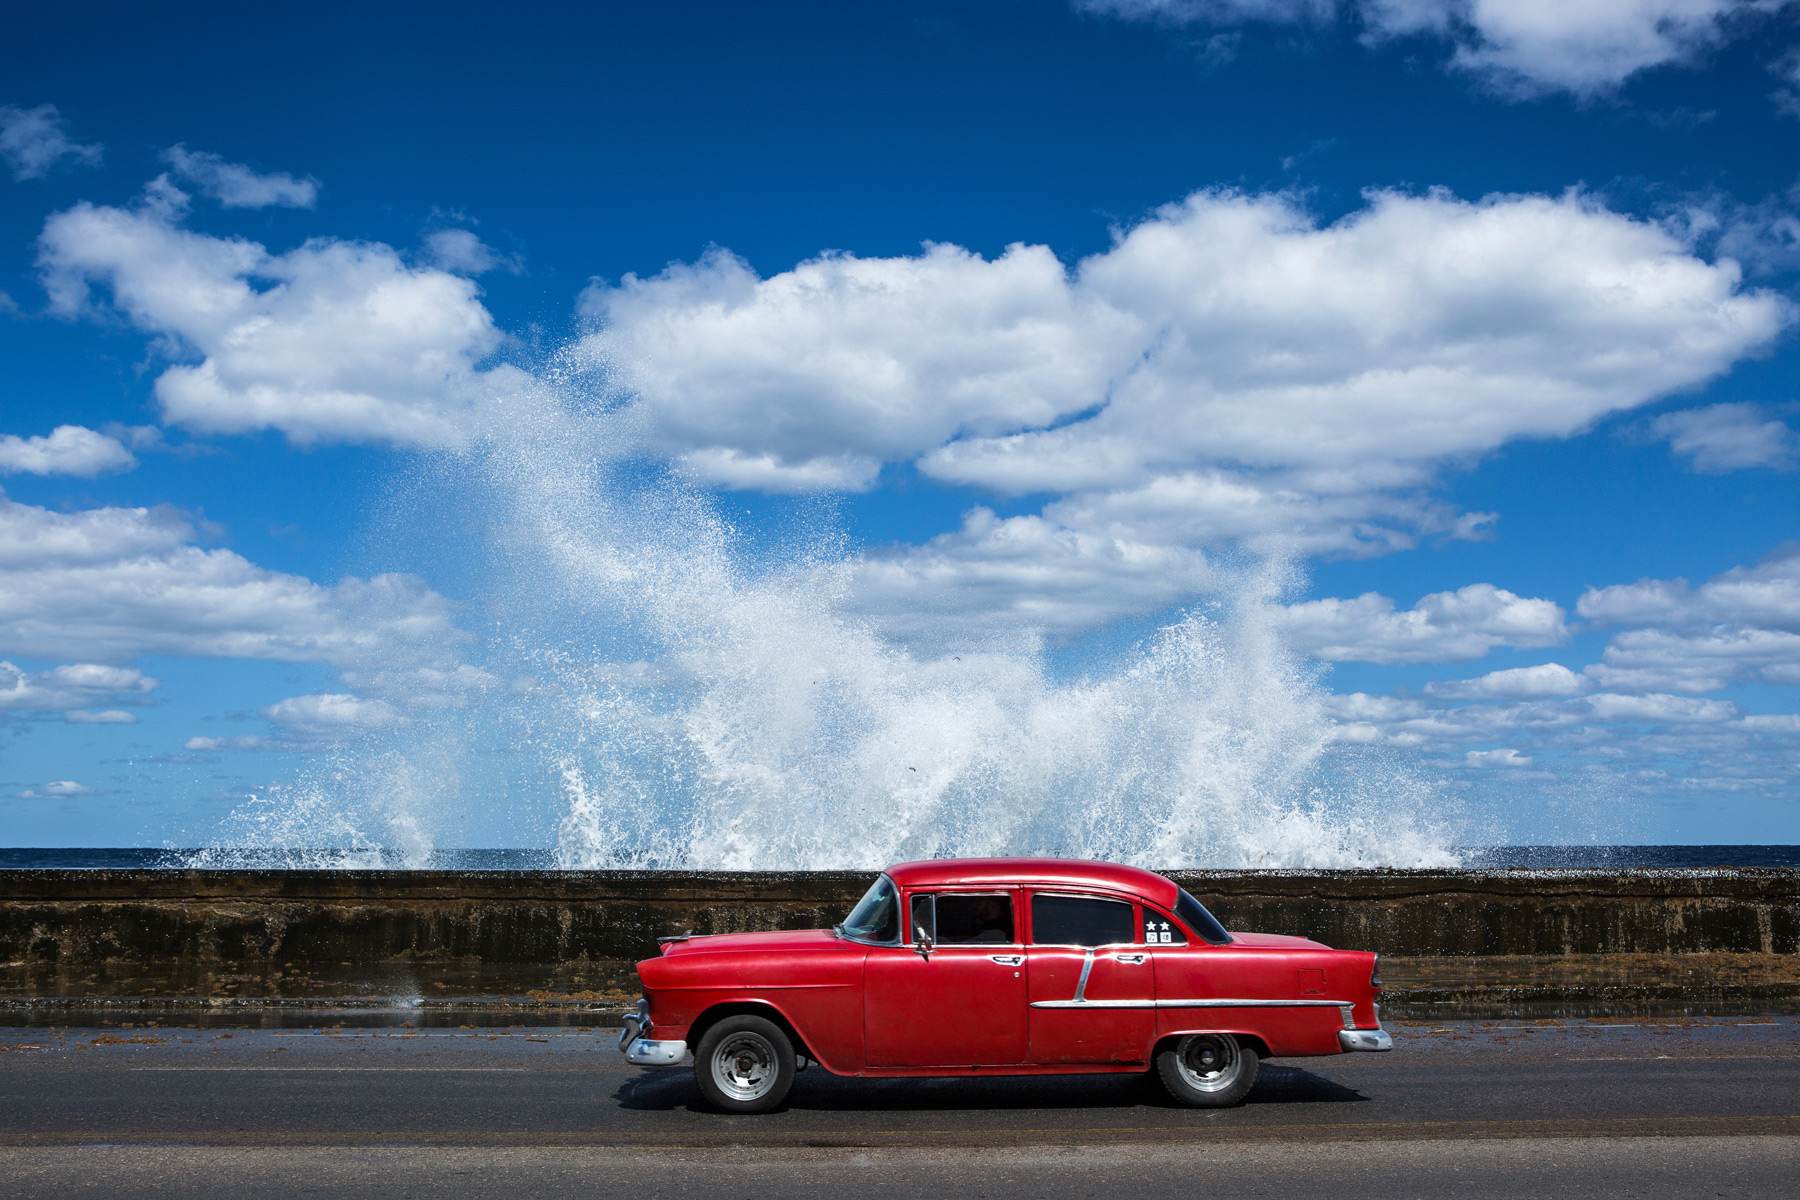 Waves splashing behind a classic American car on the Malecon in Havana, Cuba